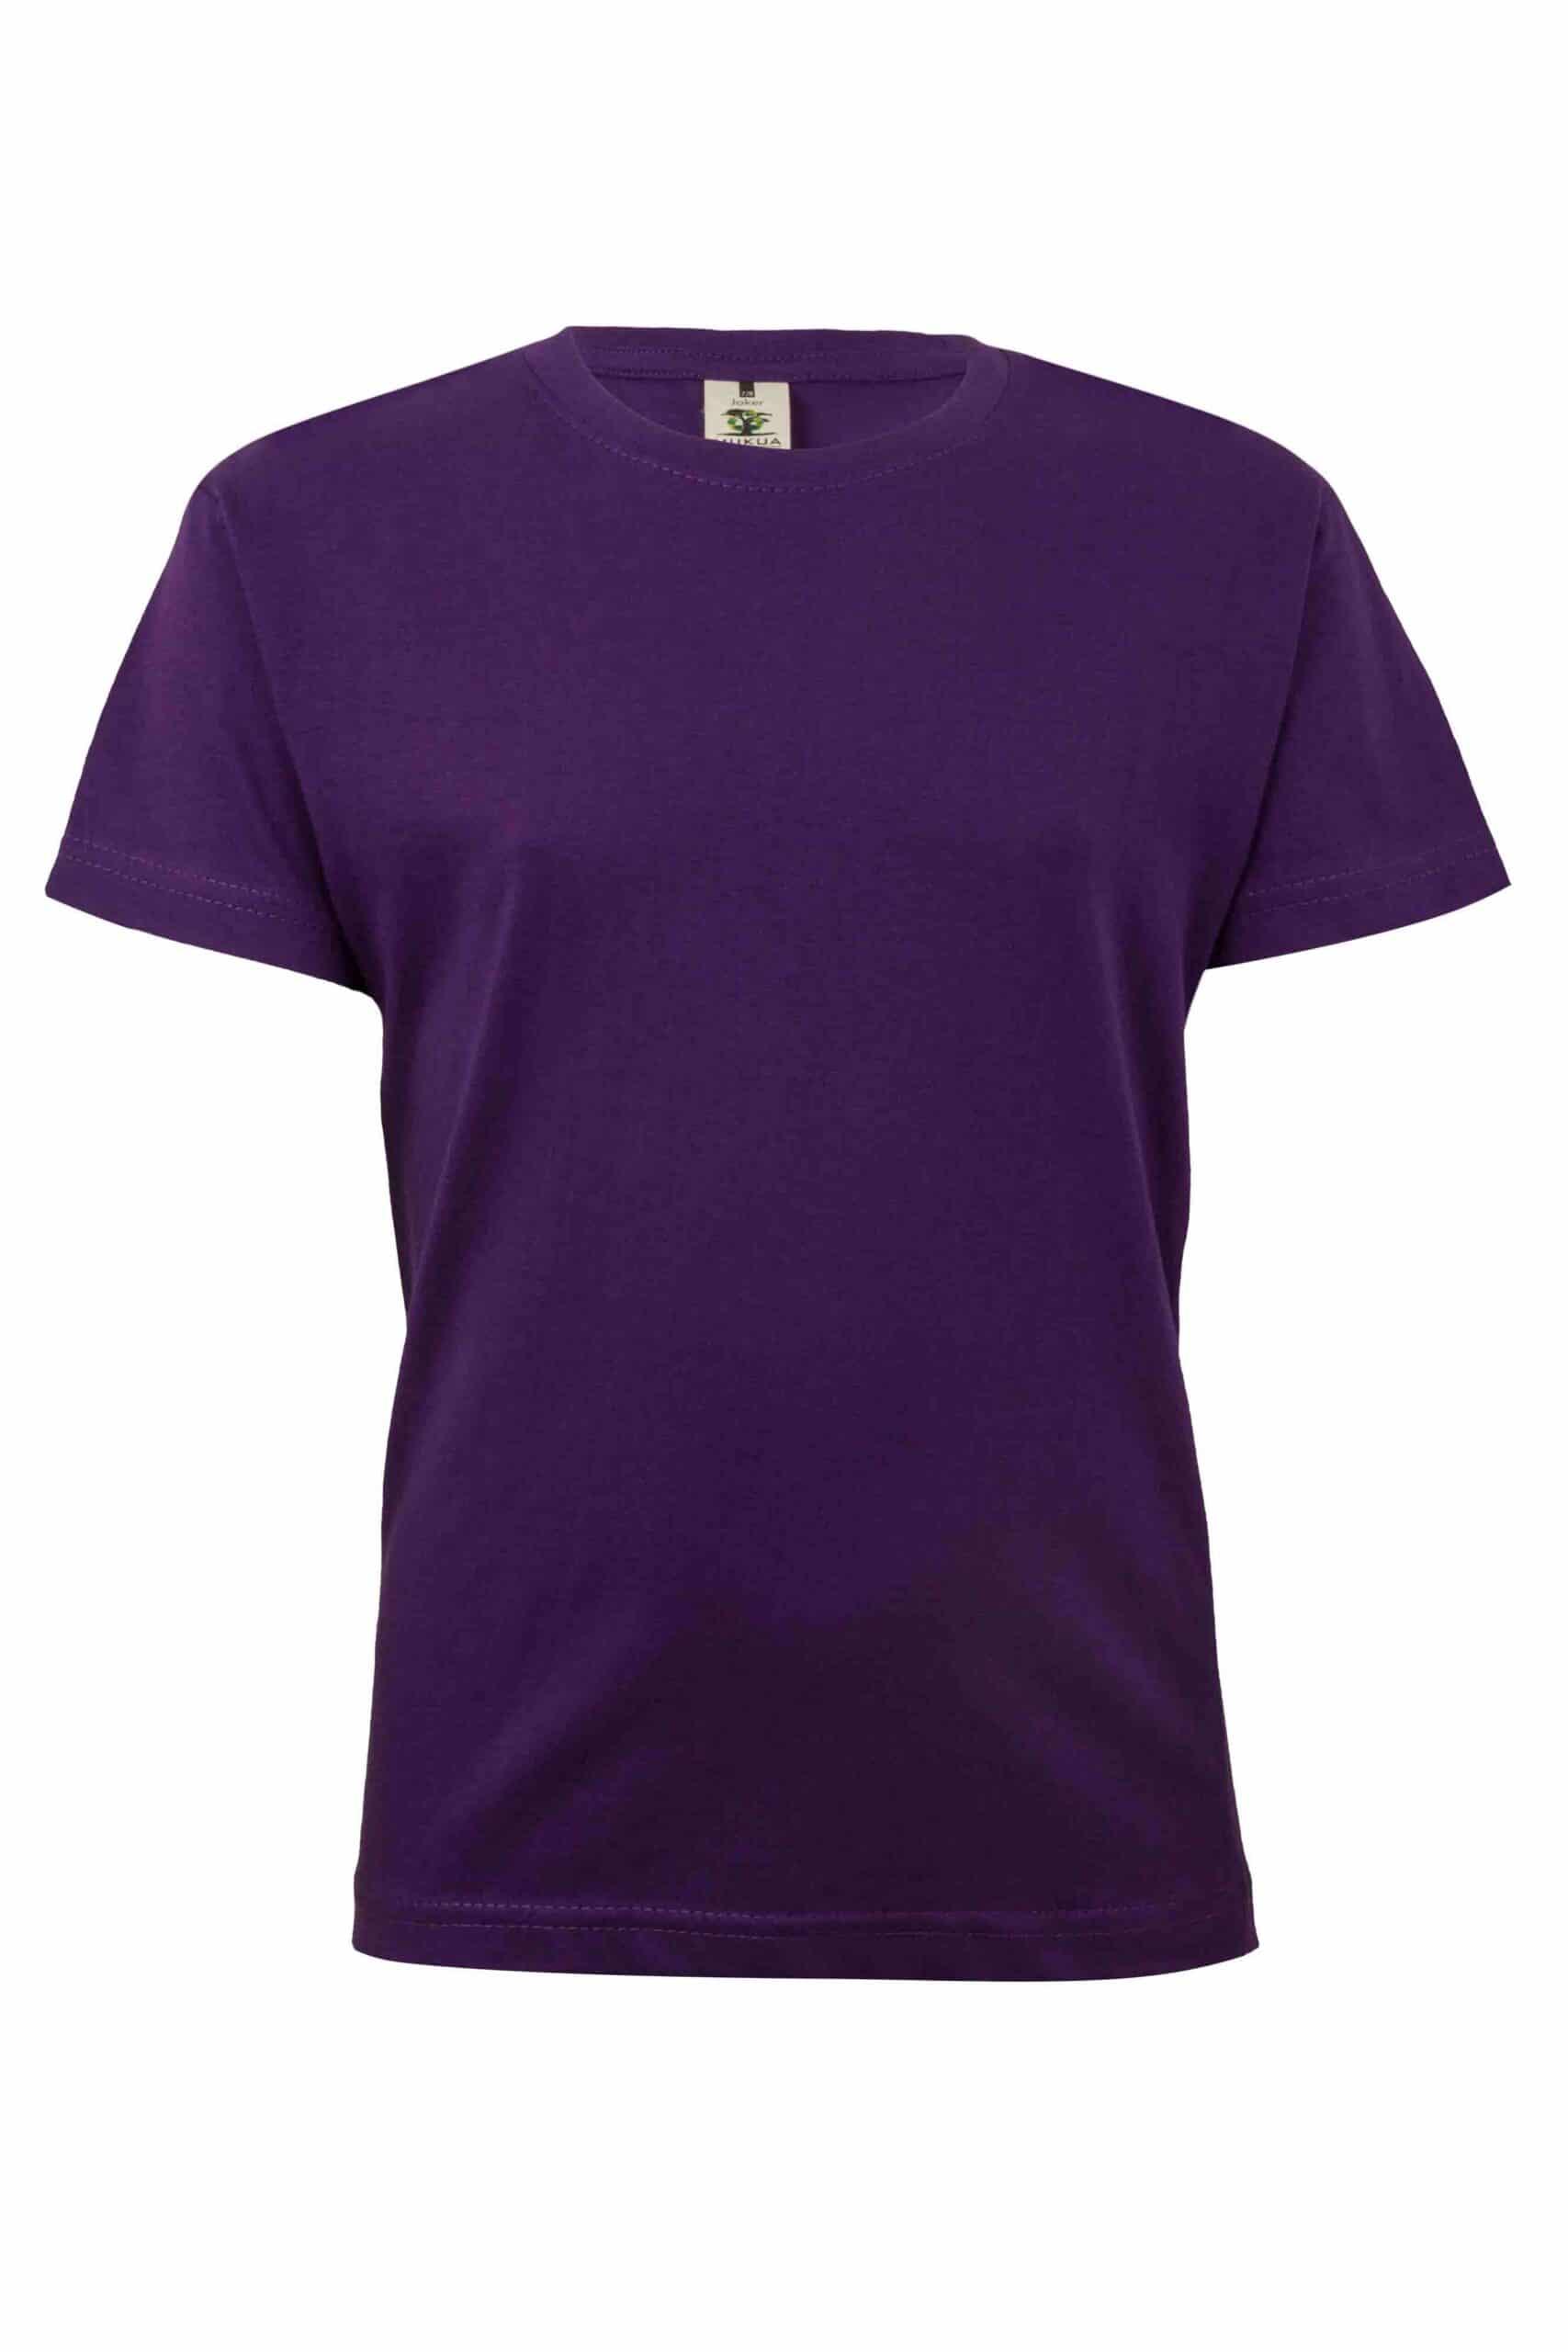 Mukua Mk175cv Camiseta Manga Corta NiÑo Purple